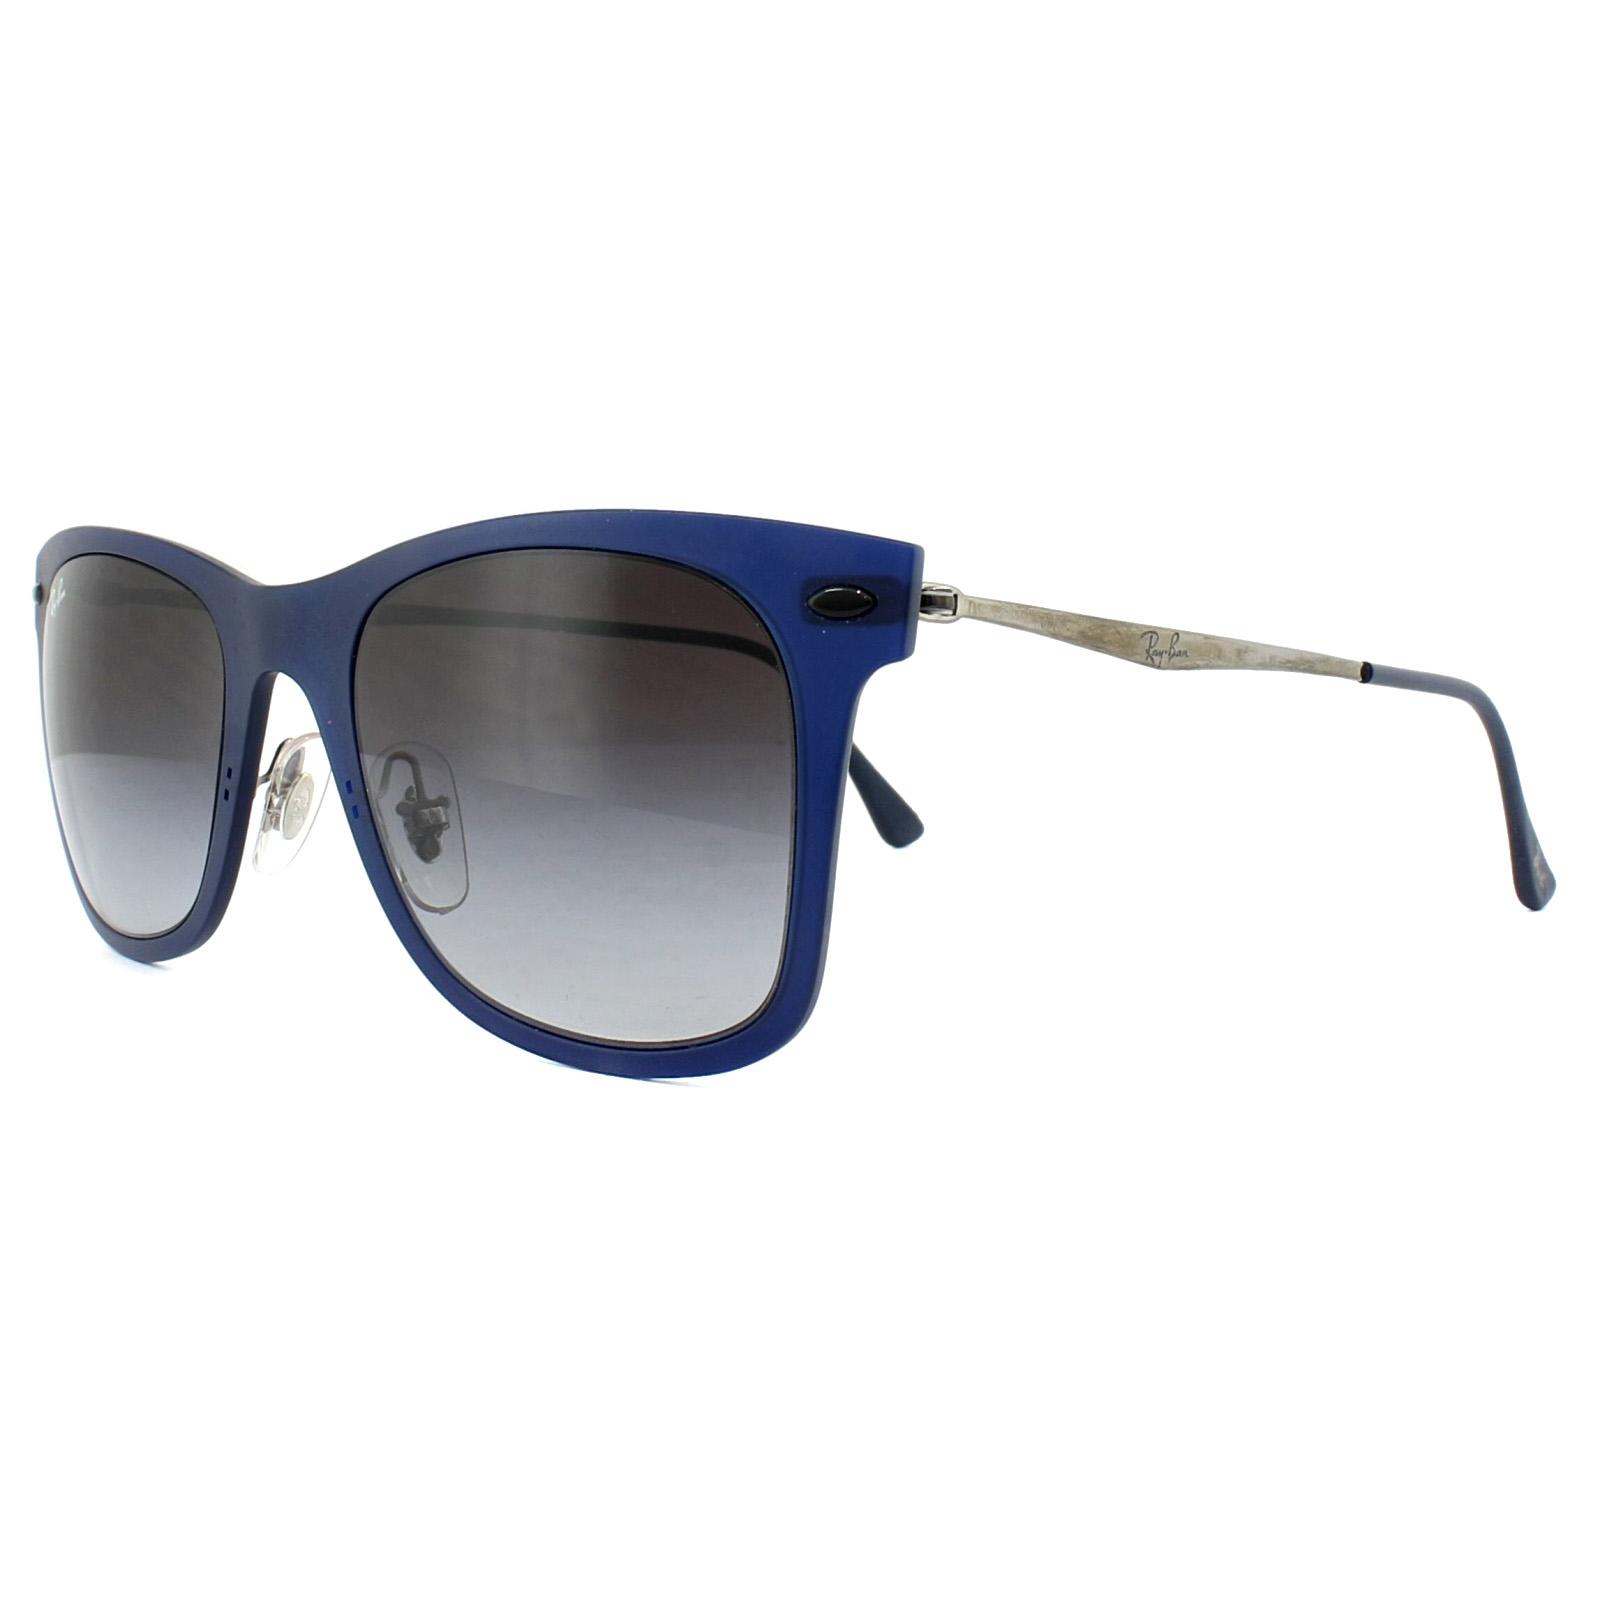 Sentinel Ray-Ban Sunglasses Wayfarer Light Ray 4210 895 8G Blue Gunmetal  Grey Gradient a9892da88b